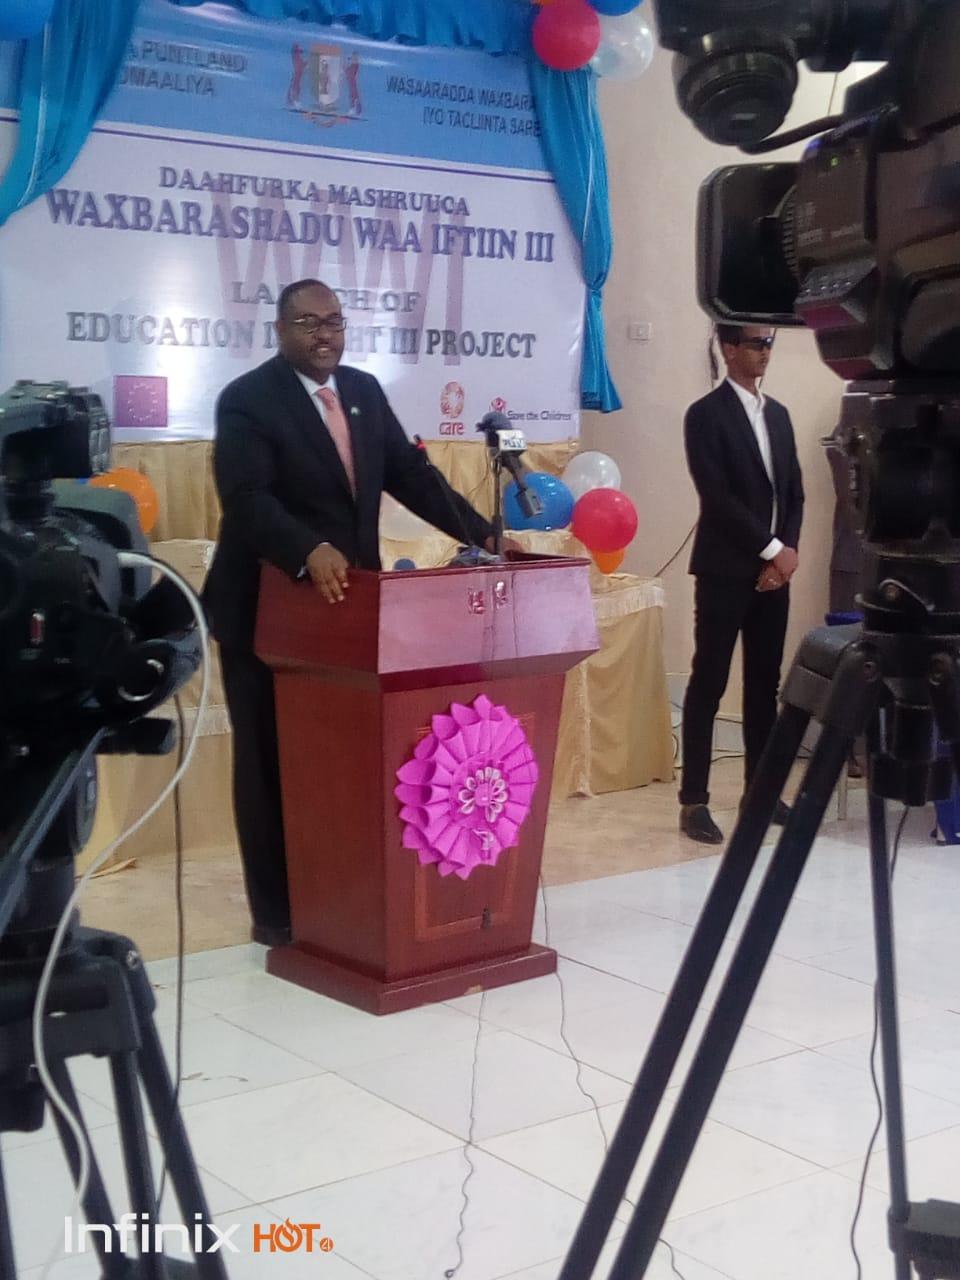 Launch of Education for Light III Project PUNTLAND SOMALIA Puntland 5